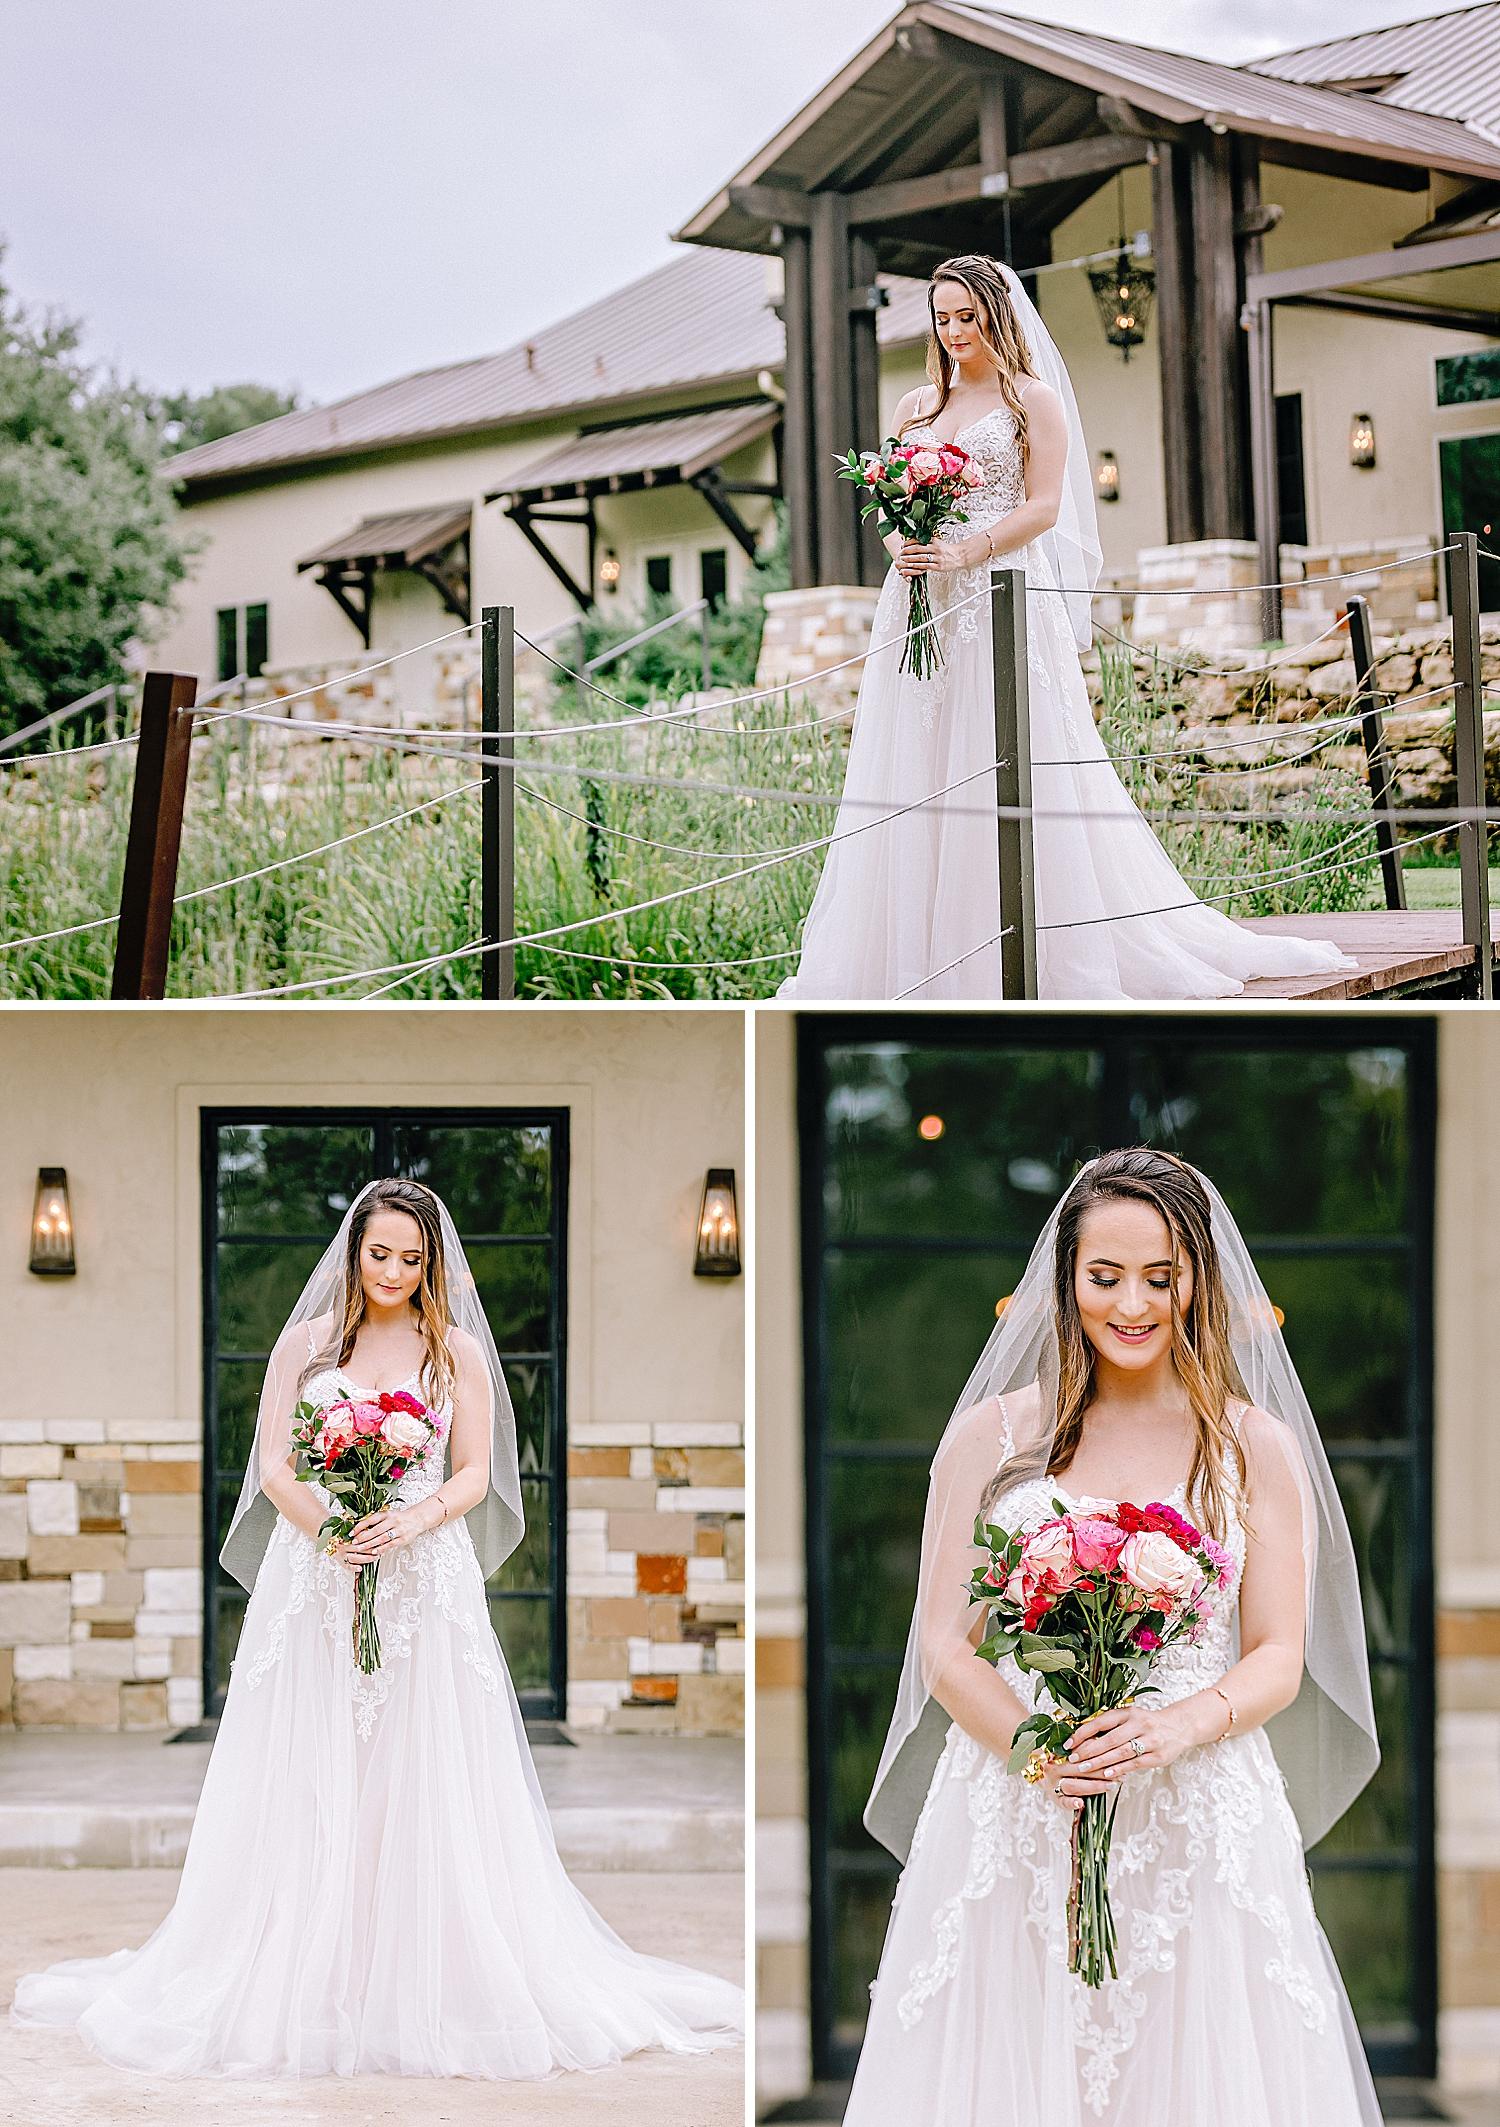 Carly-Barton-Photography-Bridal-Photos-Remis-Ridge-Hidden-Falls-New-Braunfels-Texas-Bride_0017.jpg